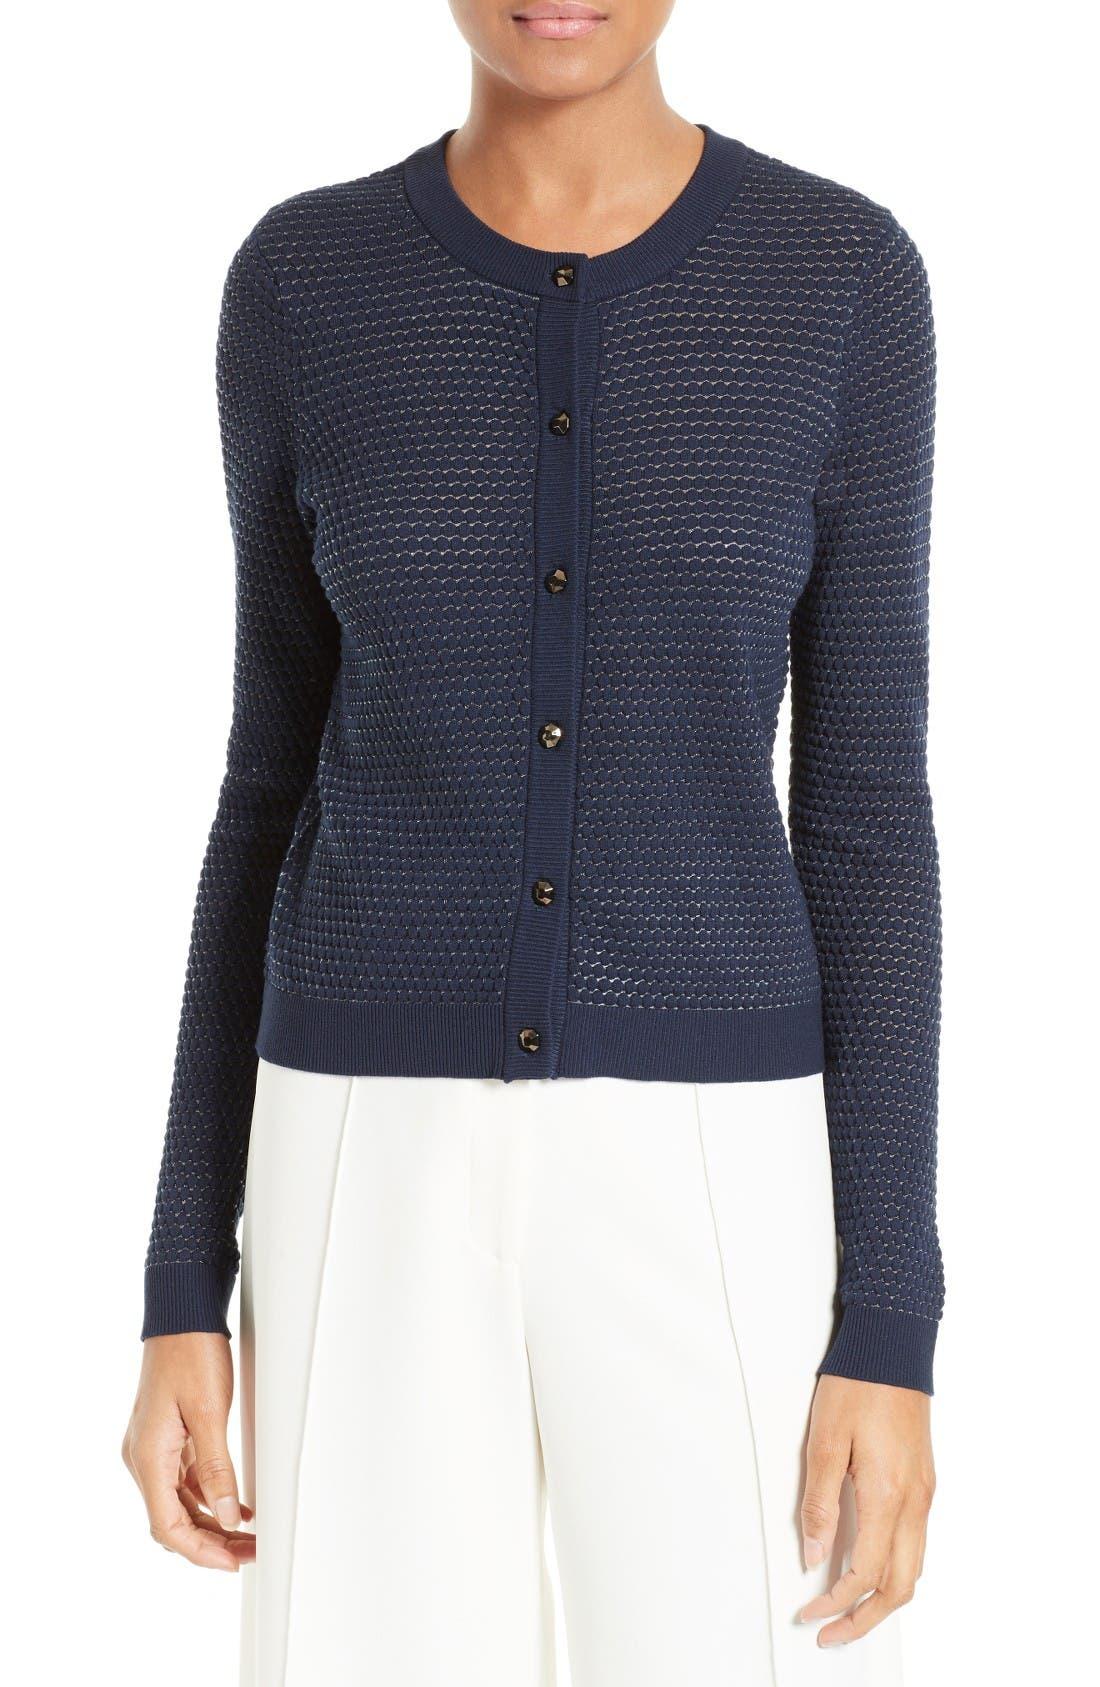 Main Image - Milly Hexagon Knit Cardigan